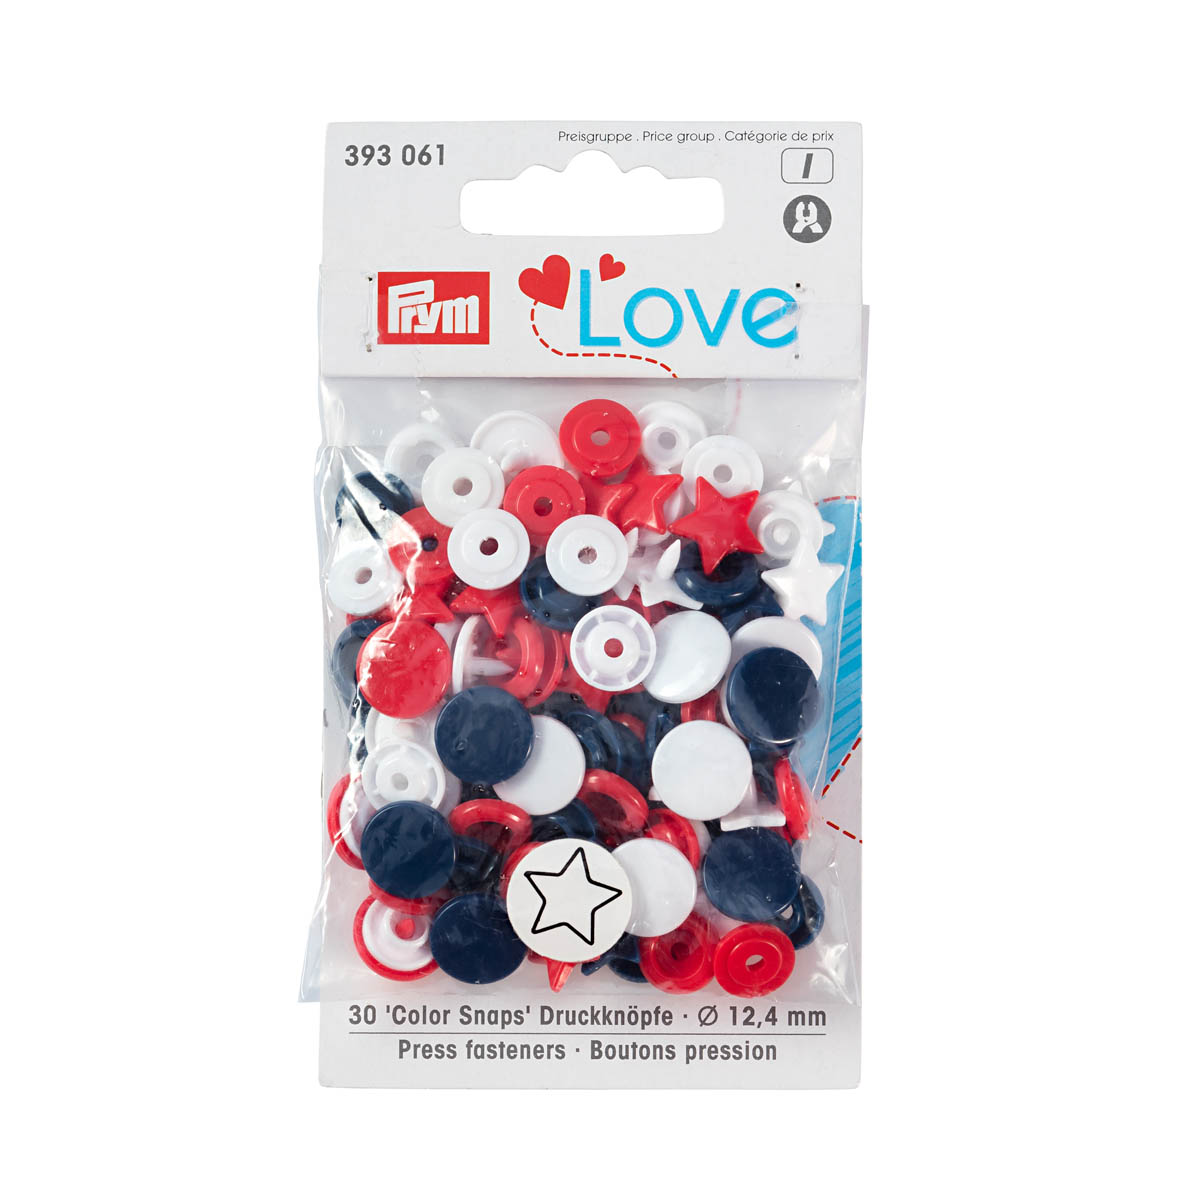 393061 Kнопки 'Звезда' Color Snaps Prym Love, красный/белый/синий, 12мм, 30шт Prym Prym